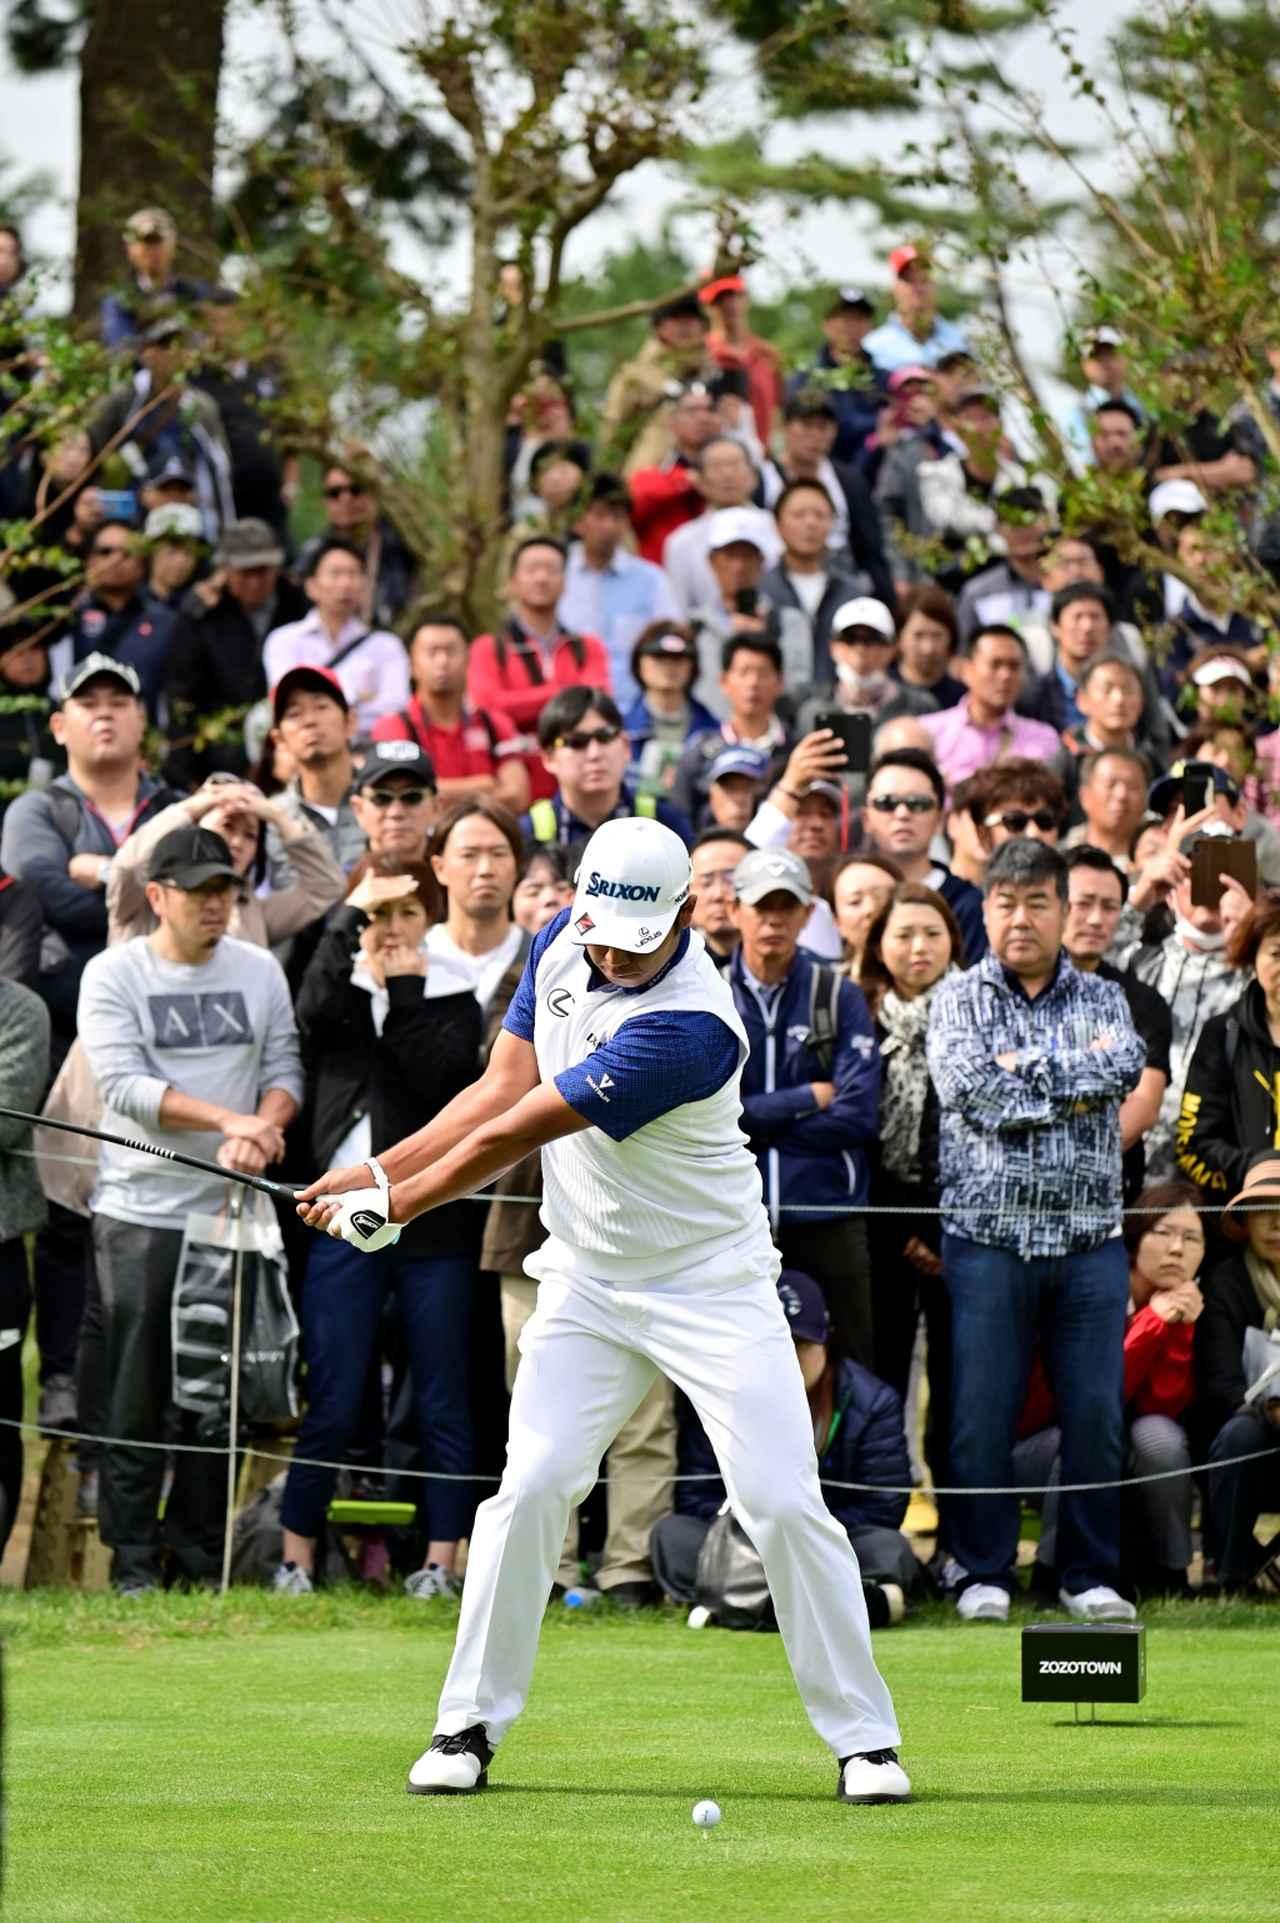 Images : 2番目の画像 - 松山英樹のドライバー連続写真 - みんなのゴルフダイジェスト